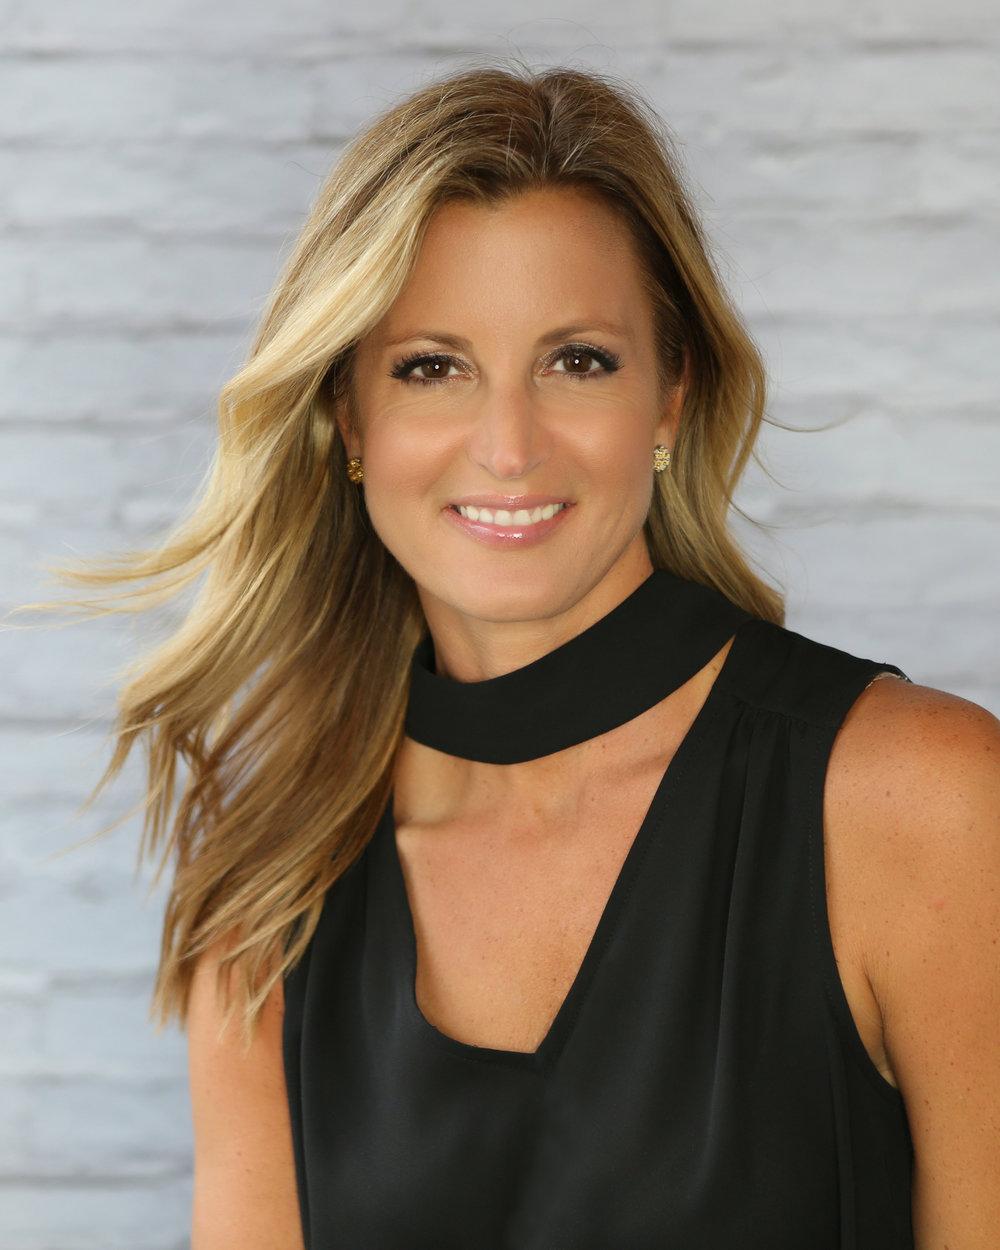 Mindy Clark, Owner, Photographer